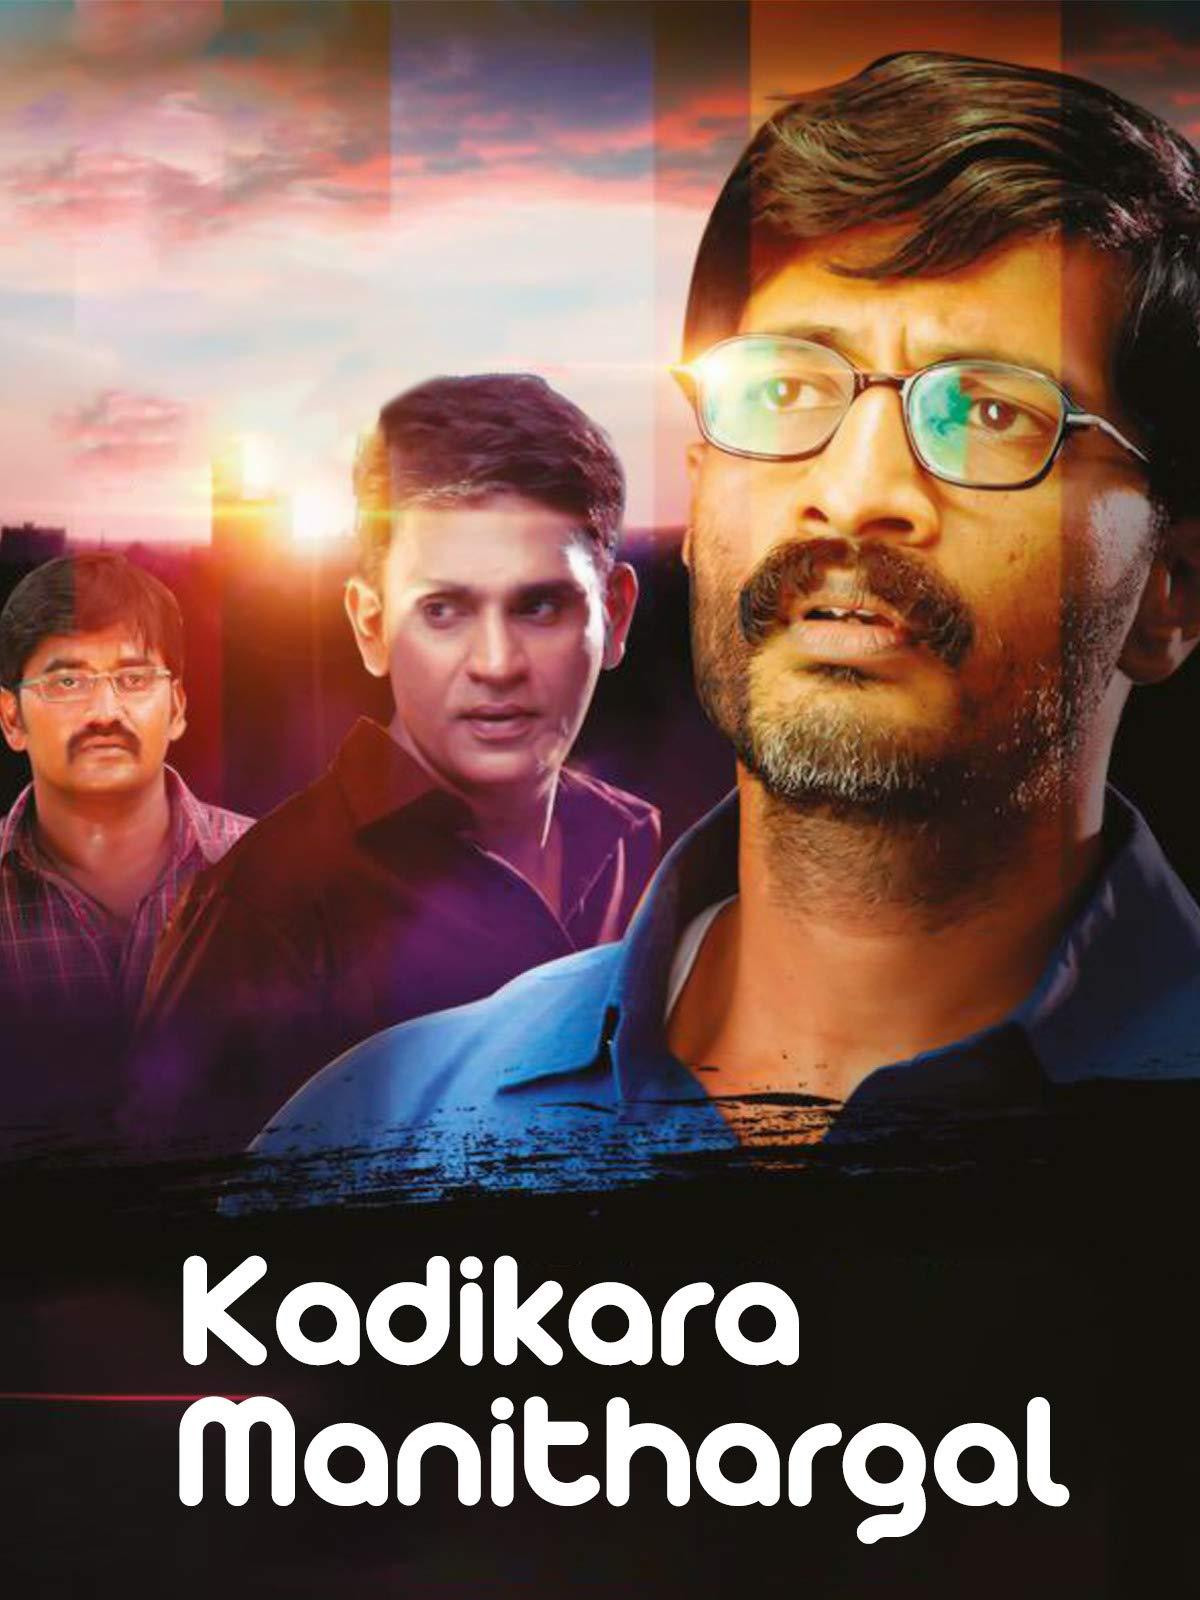 Kadikara Manithargal (Ghosla) Hindi Full Movie Download